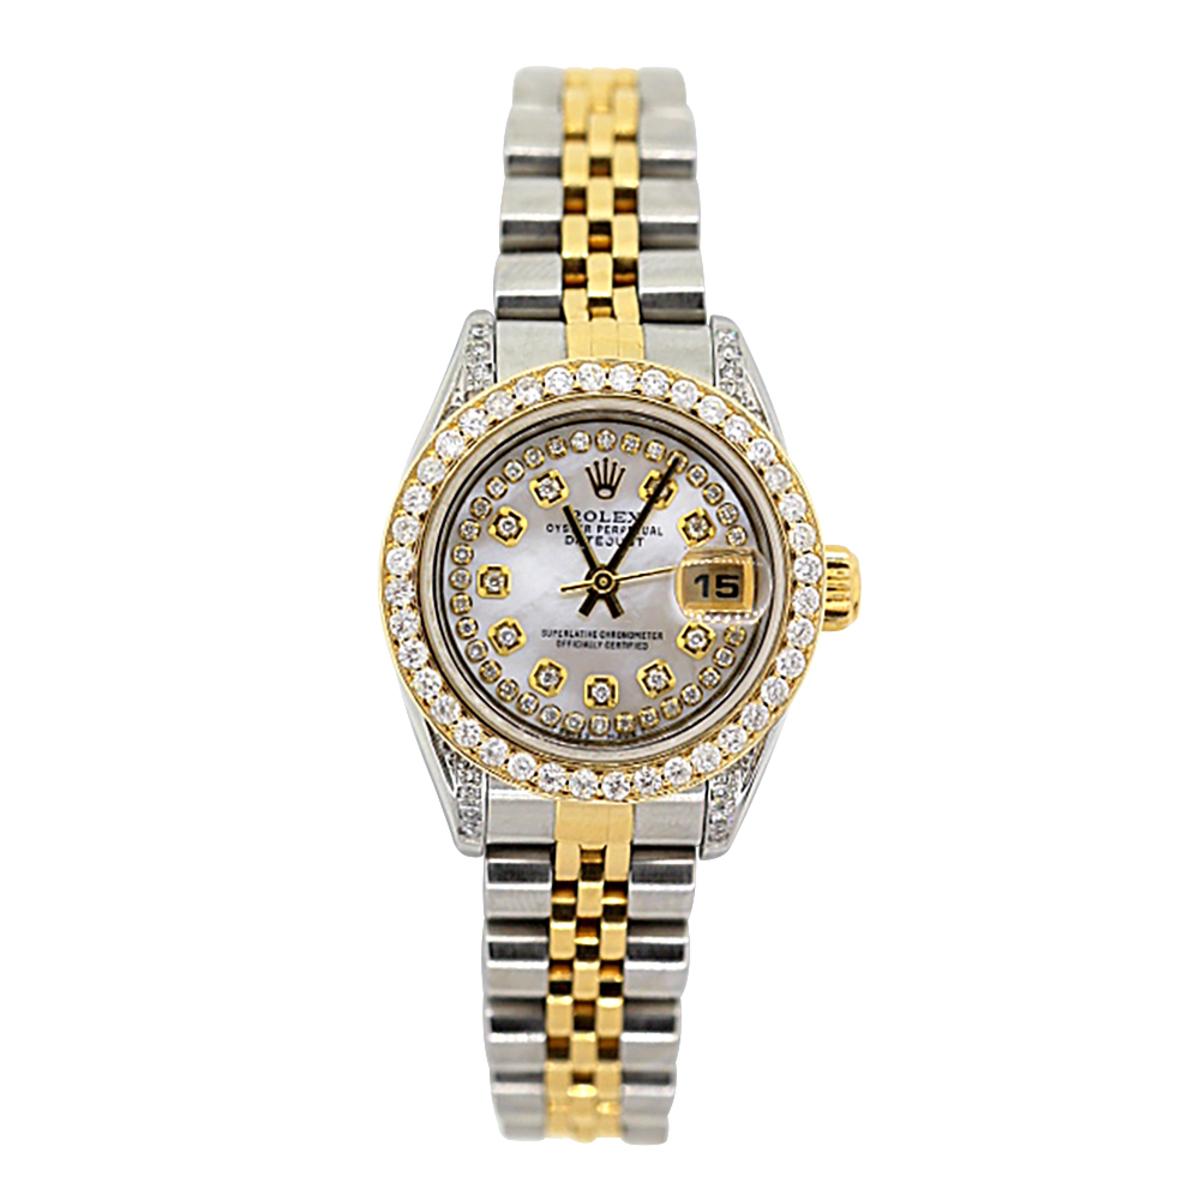 Rolex Oyster Perpetual Datejust Ladies Diamond Watch 2.2ct 18k Gold & Steel